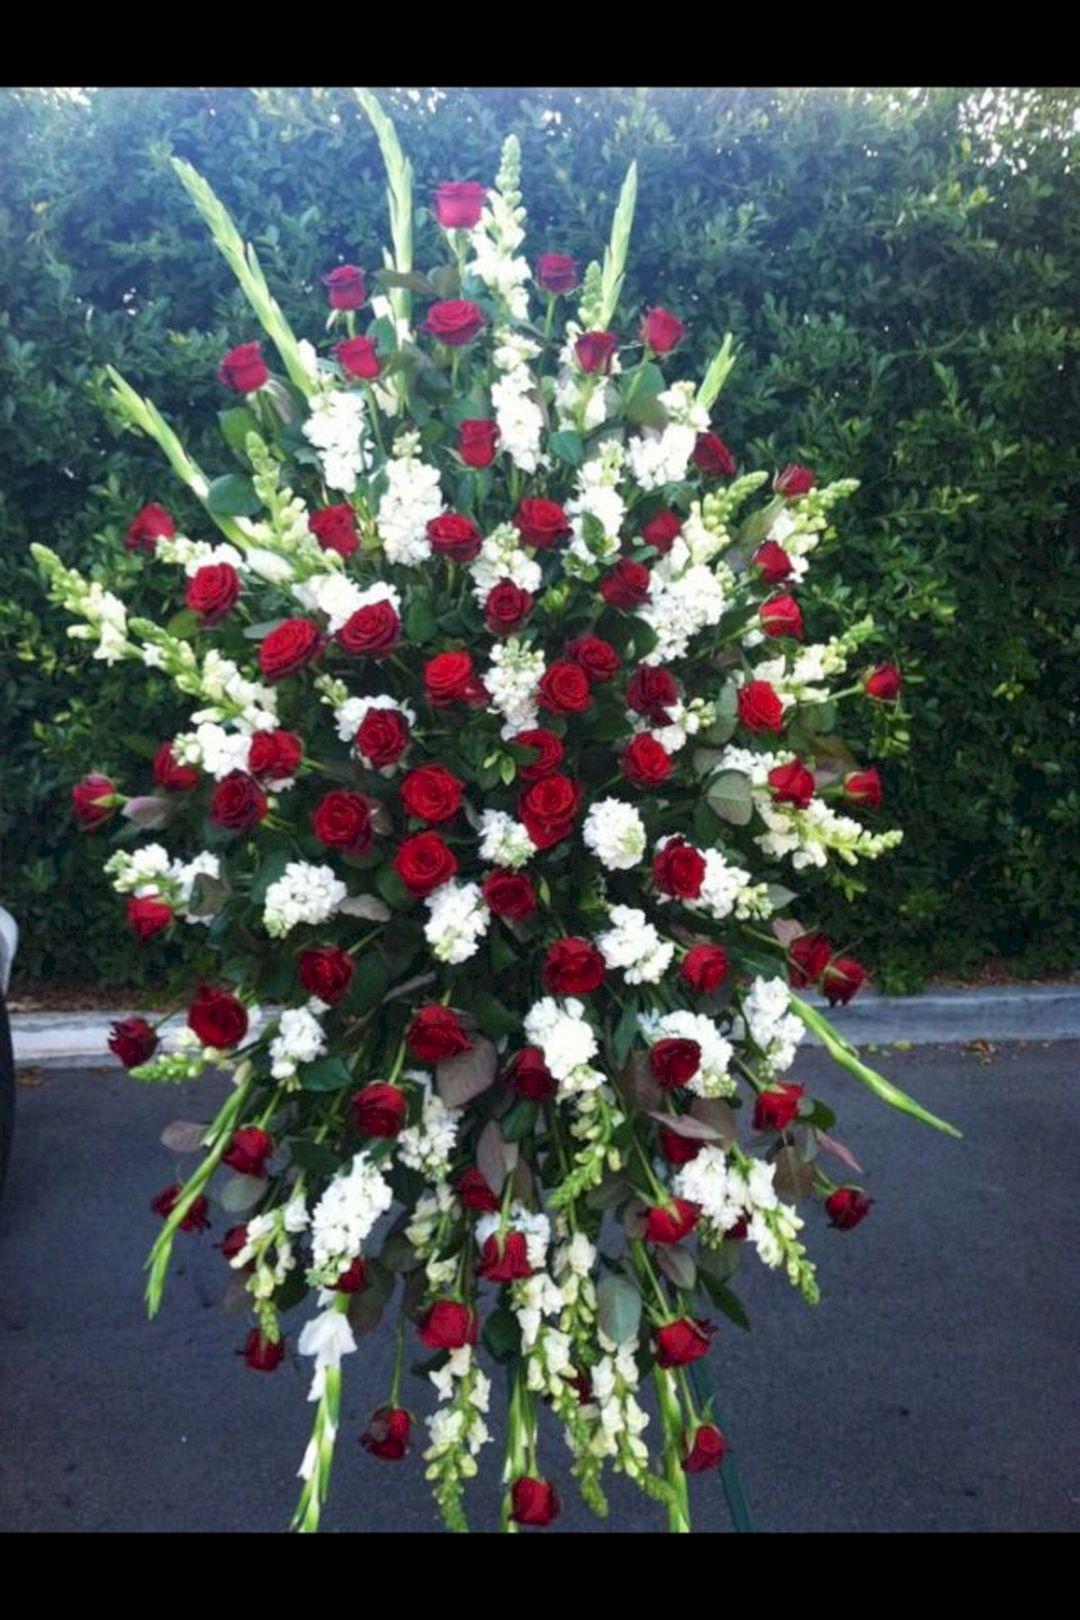 45 Beautiful Funeral Arrangements Ideas Easy To Make It Https